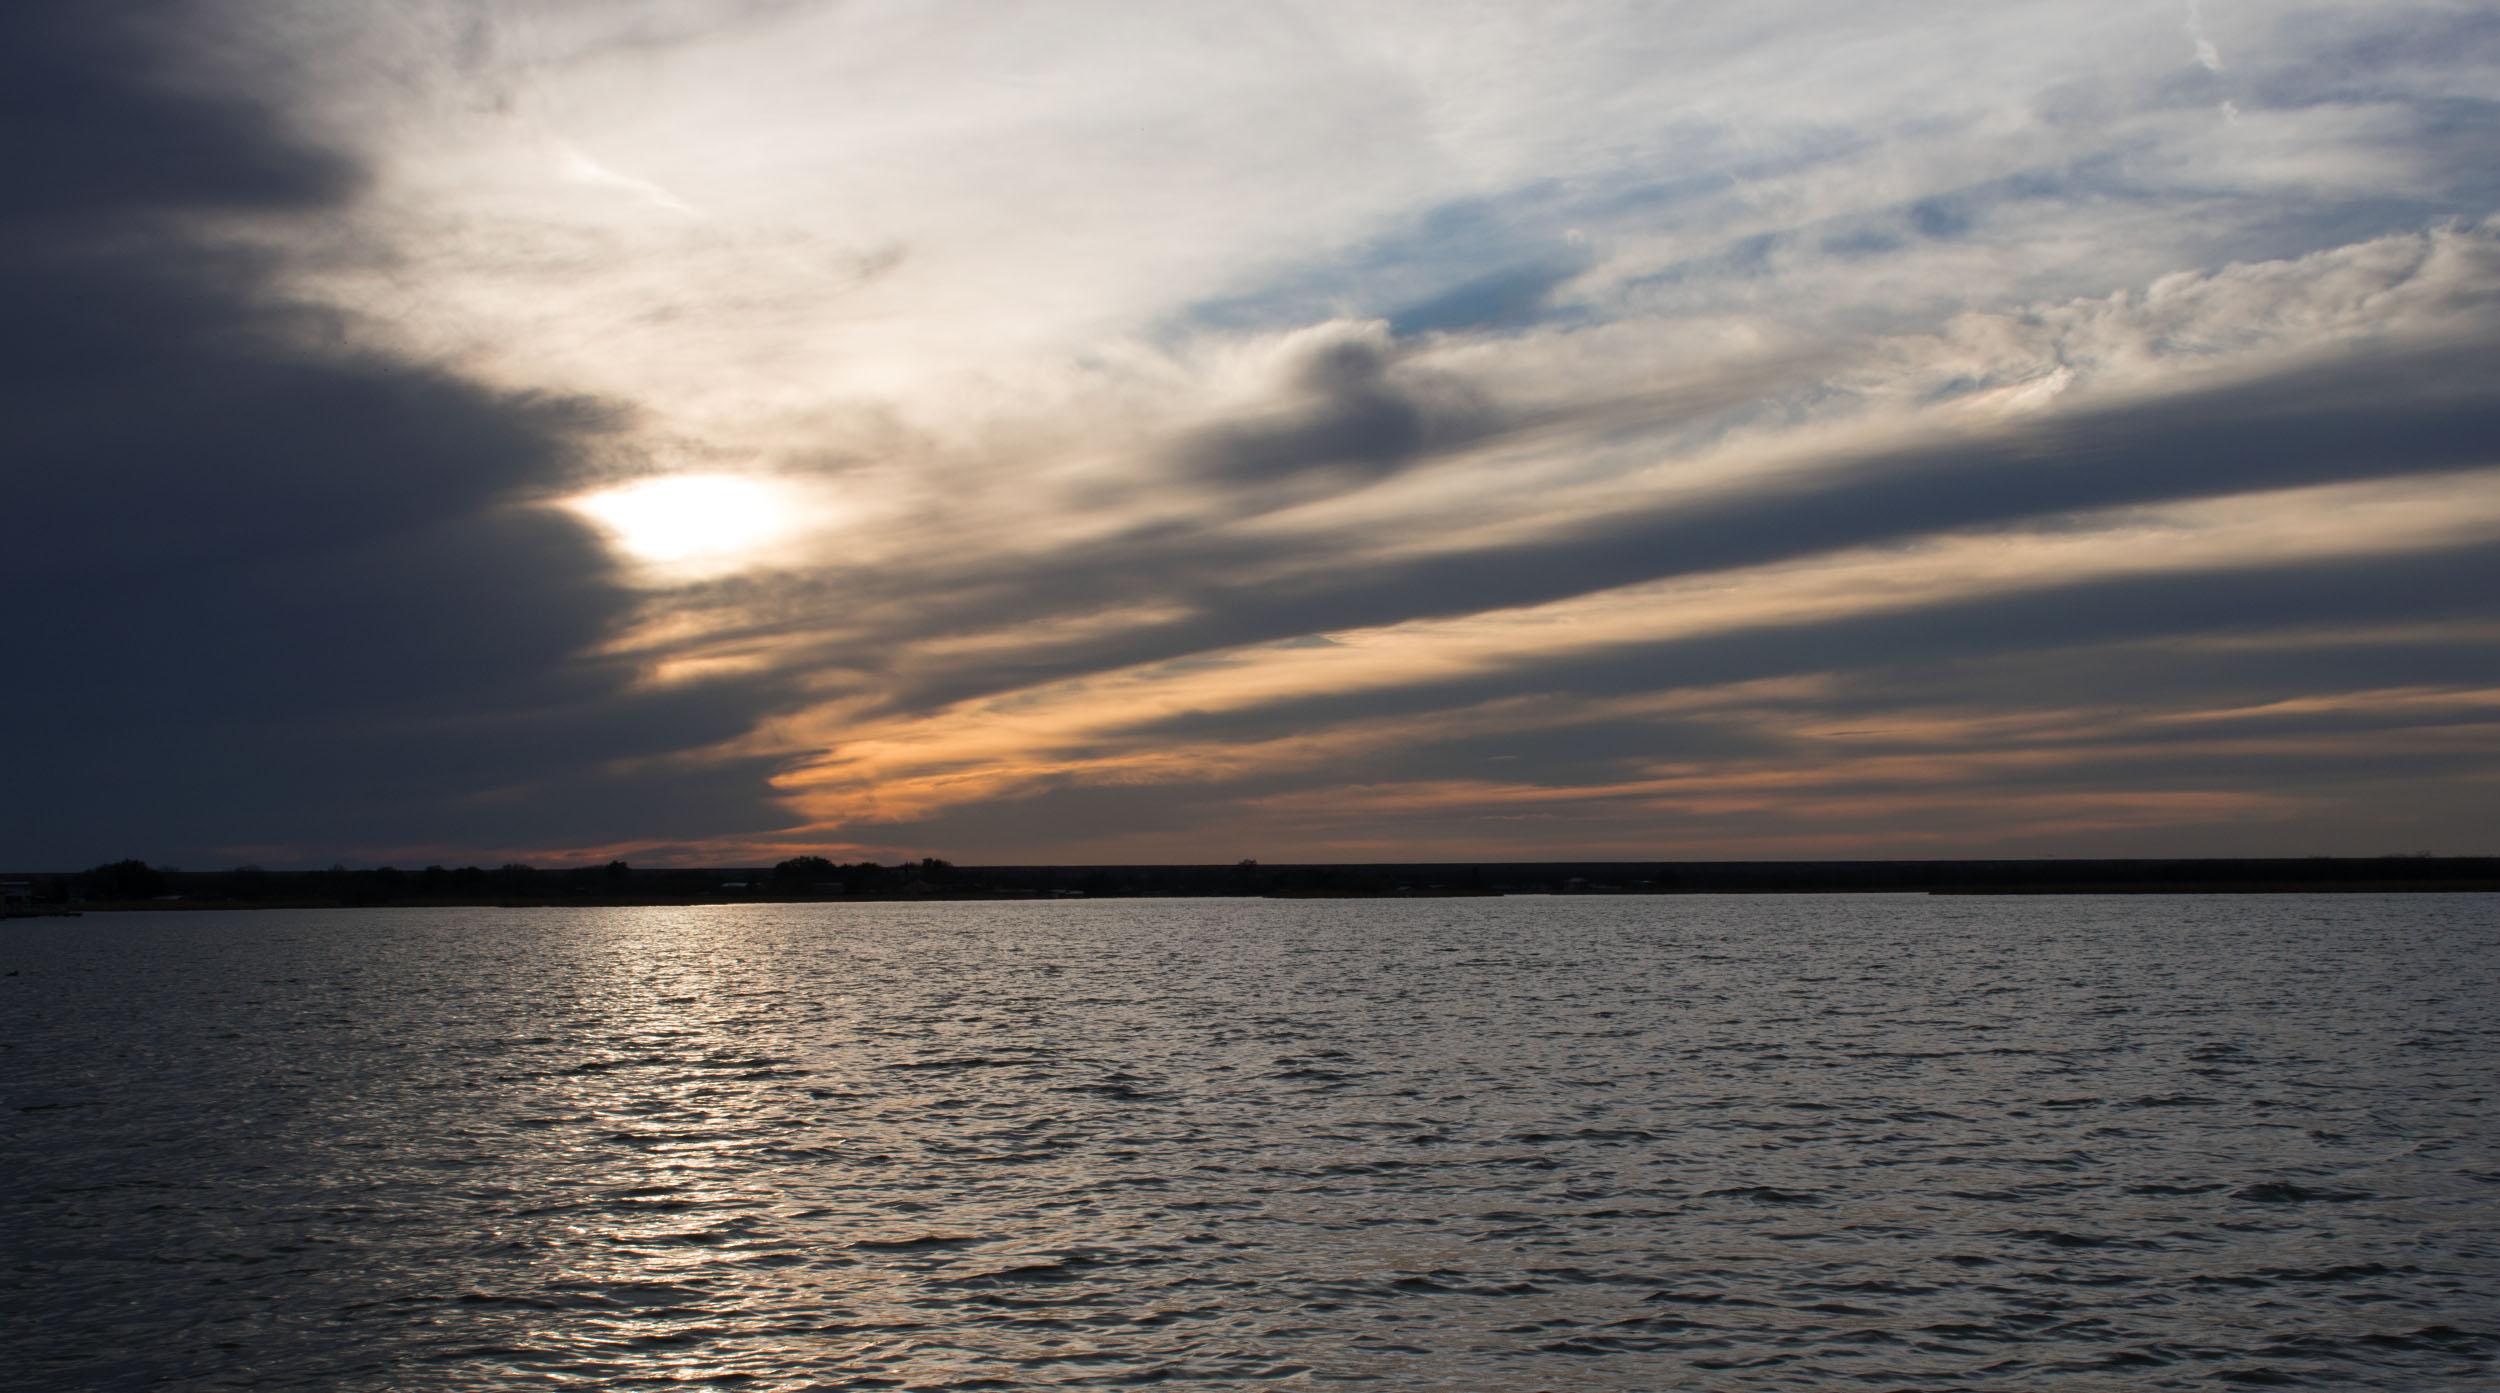 Lake Nasworthy